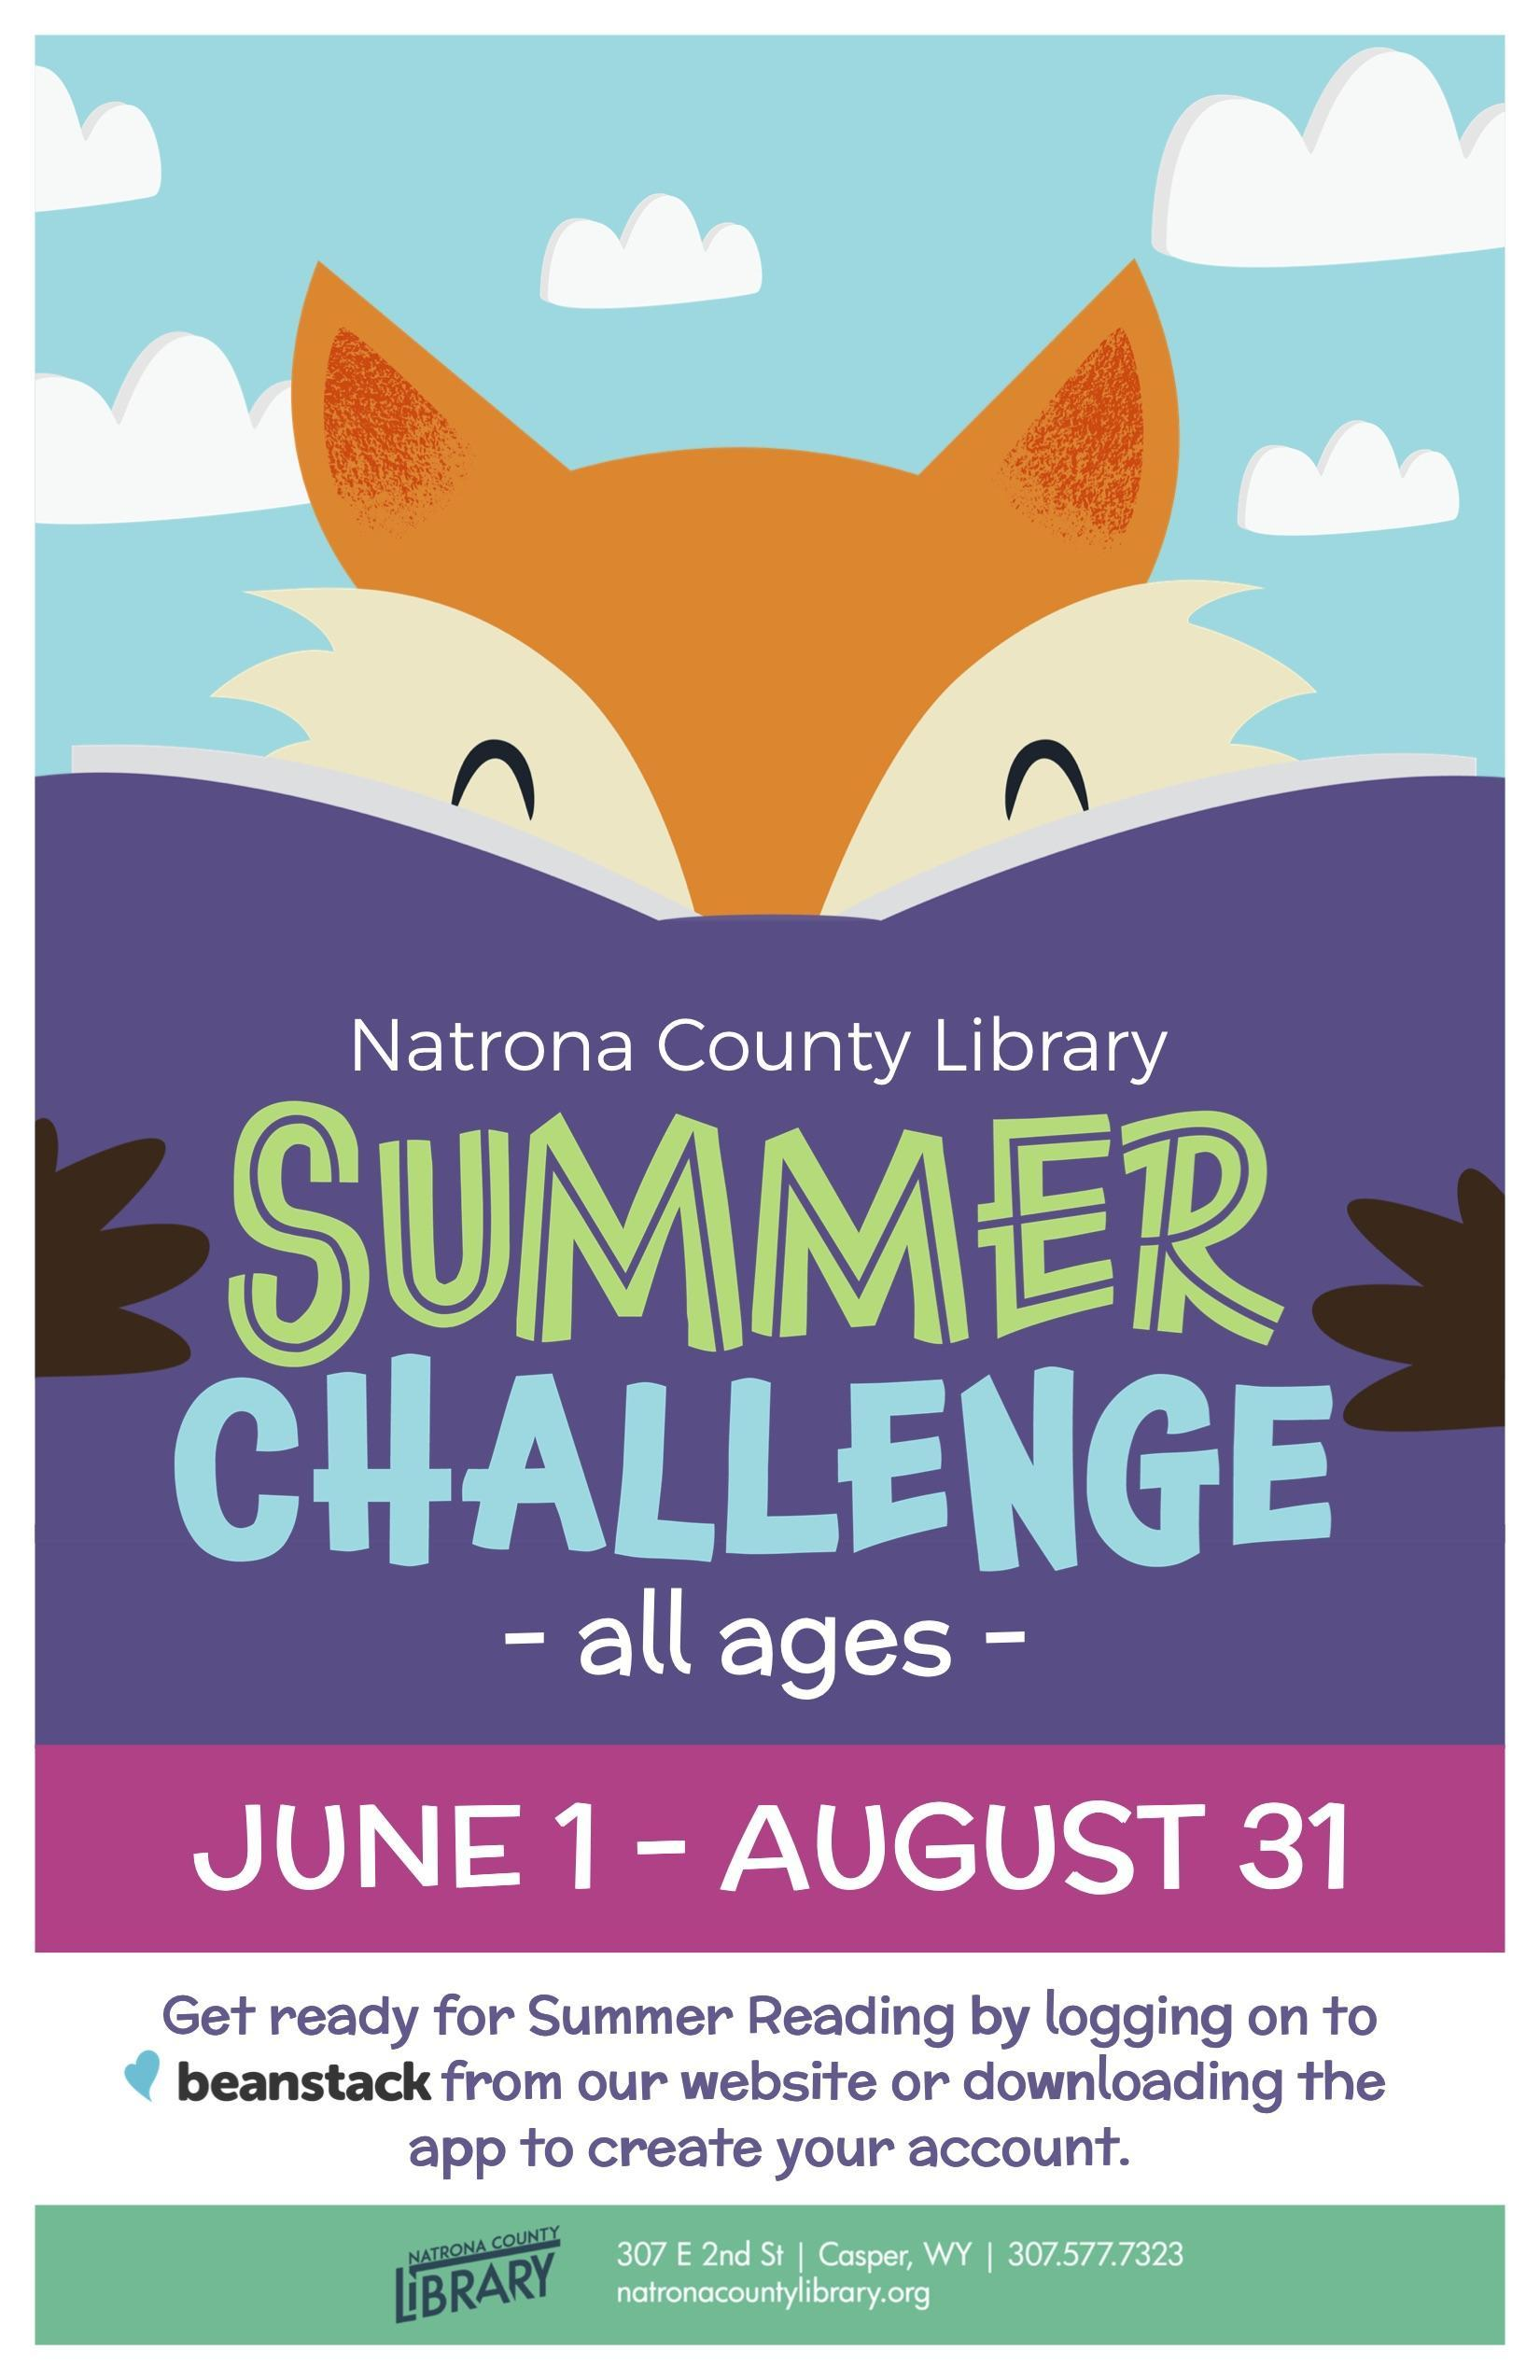 Natrona County Library summer reading program flyer